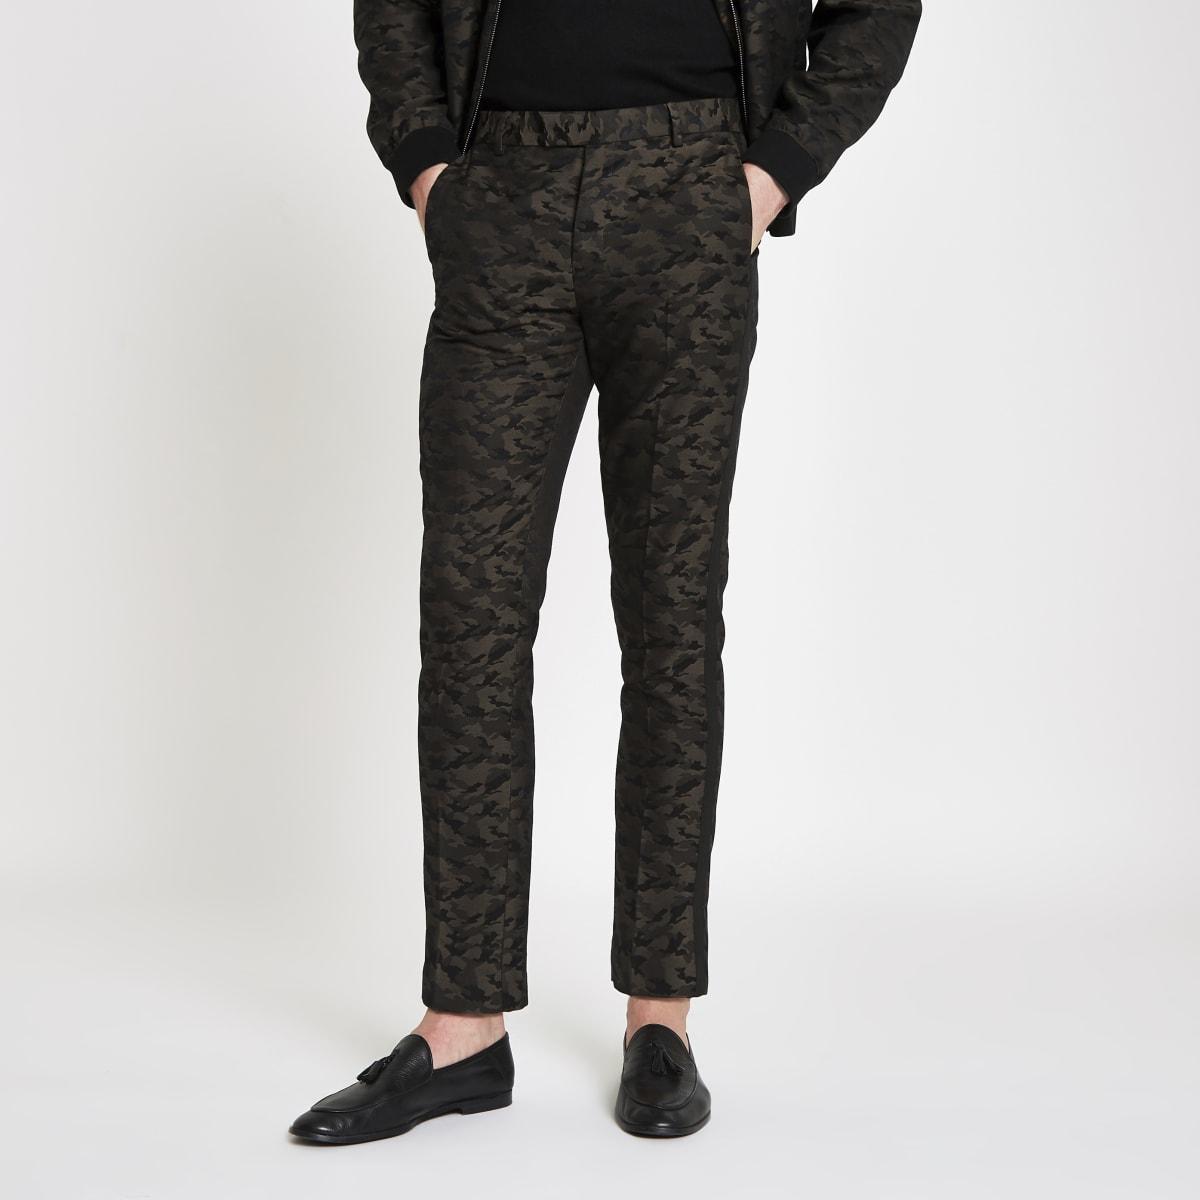 Pantalon skinny habillé motif camouflage vert